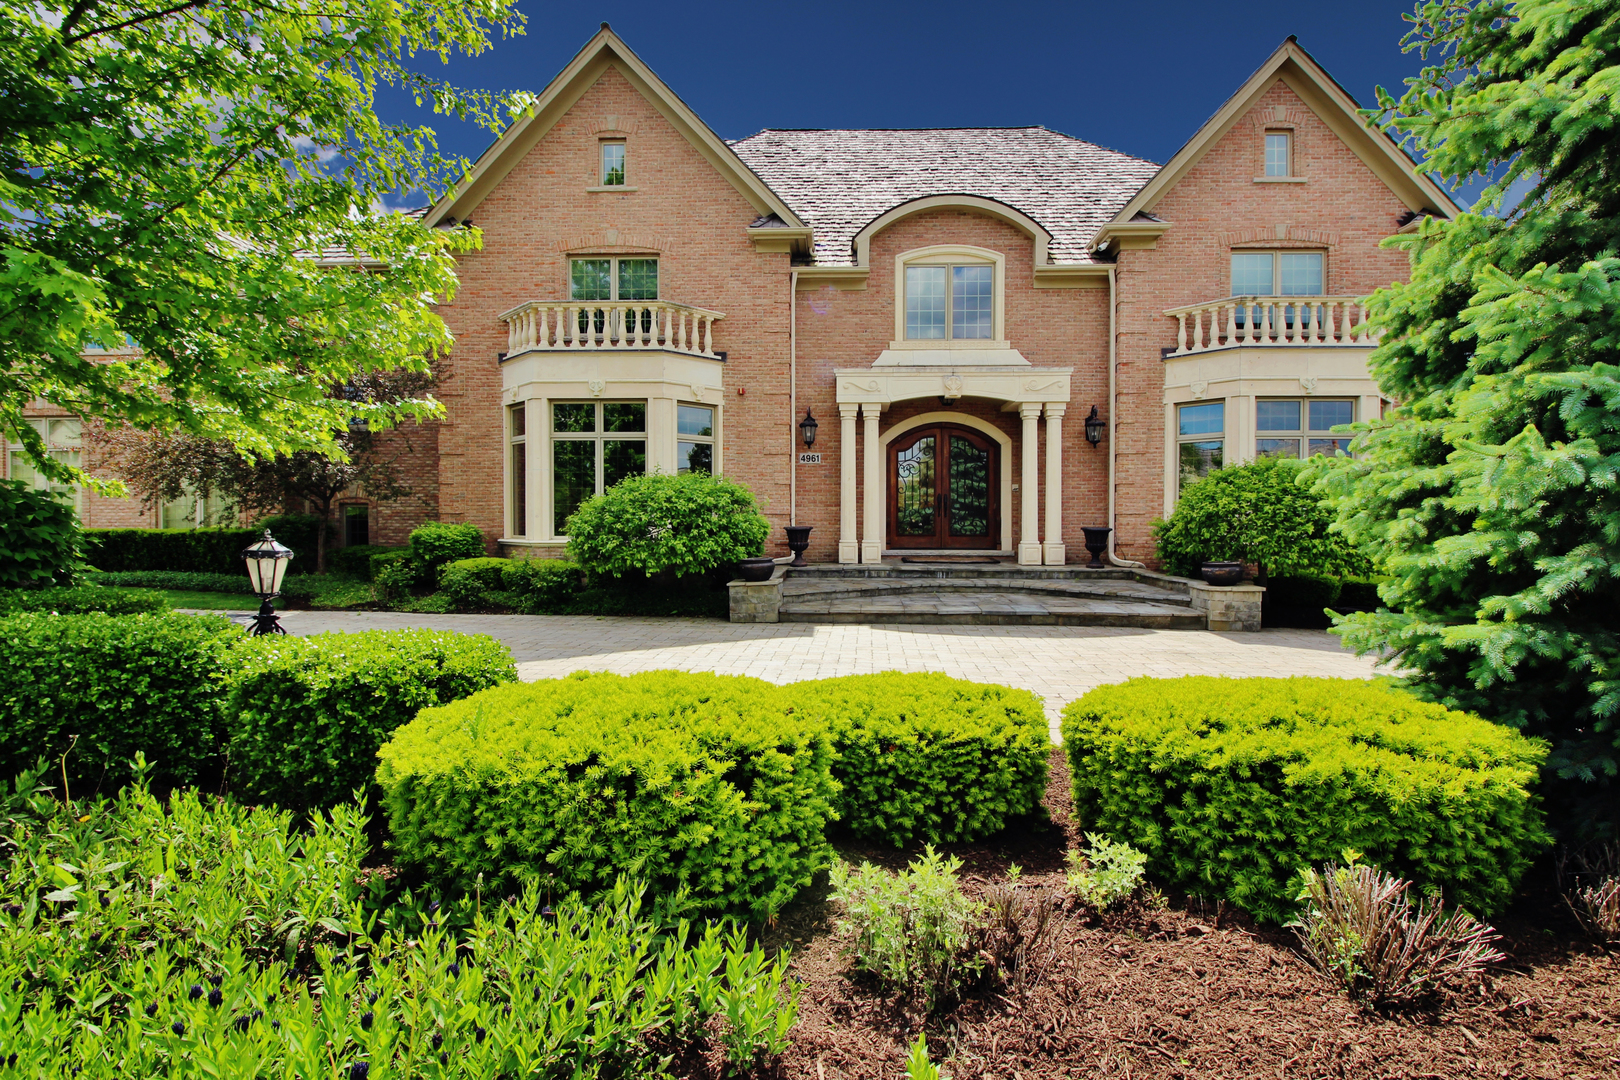 4961 Astor Court, Long Grove, Illinois 60047